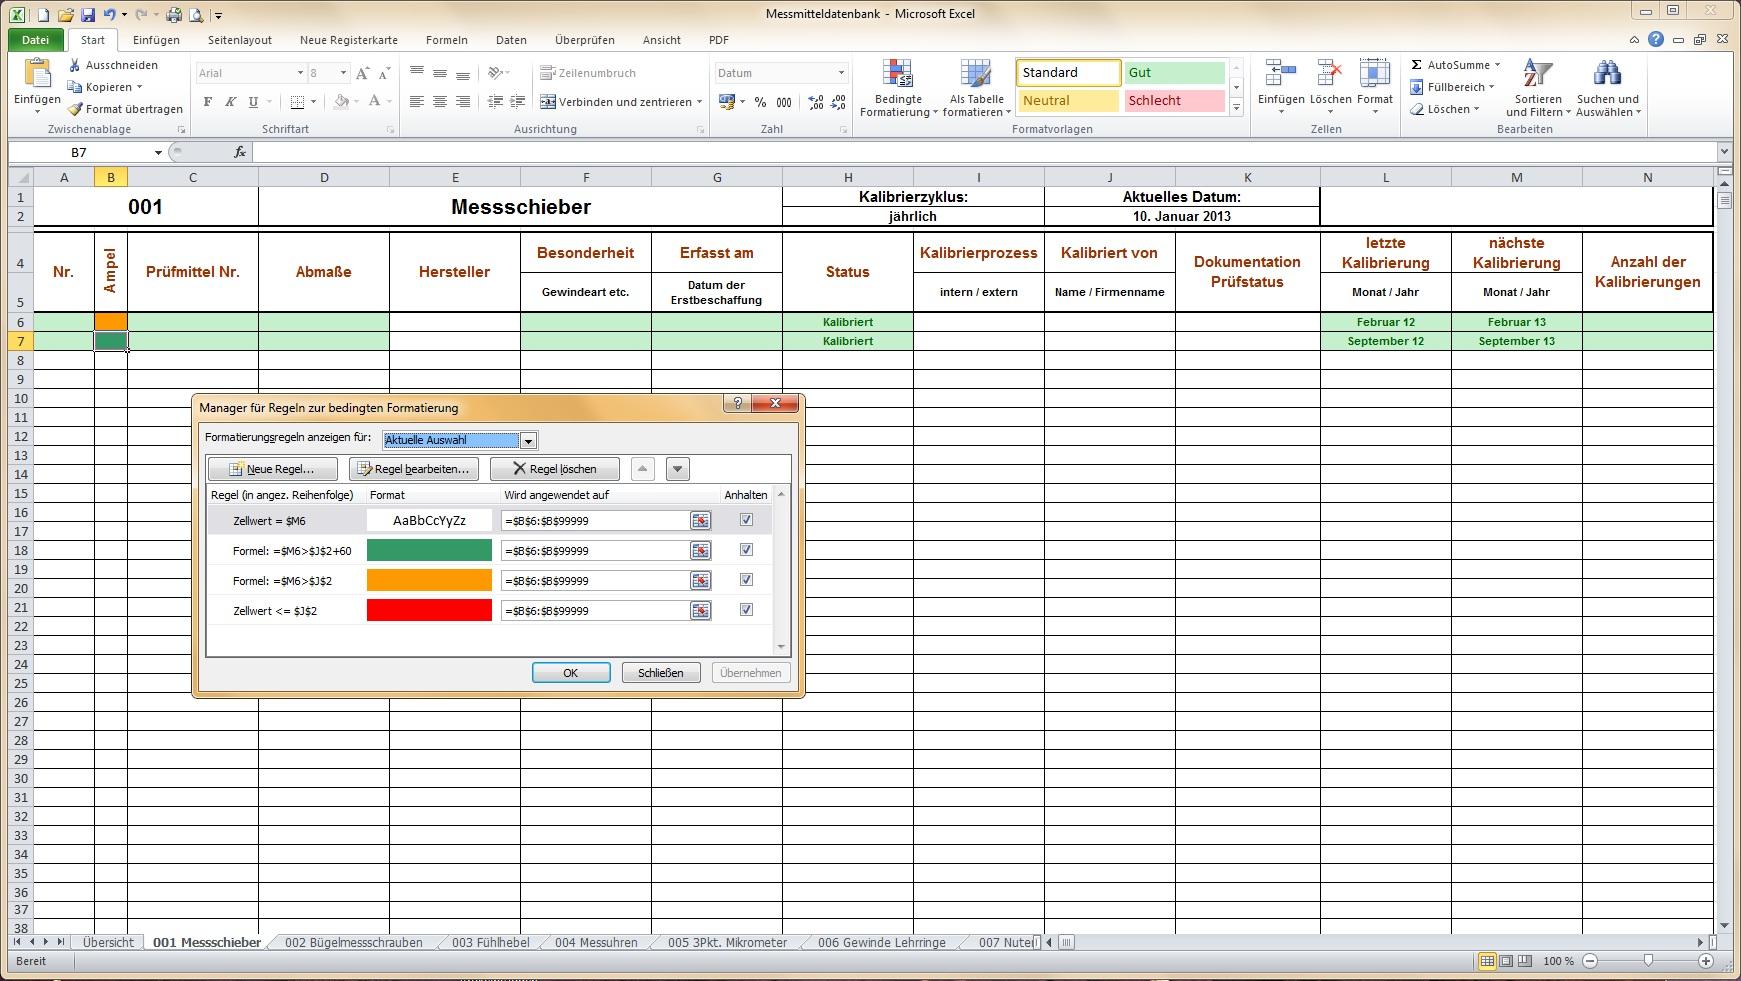 Excel Vba Userform Tabellenblatt Aktivieren : Excel vba tabellenblatt name ändern werte in